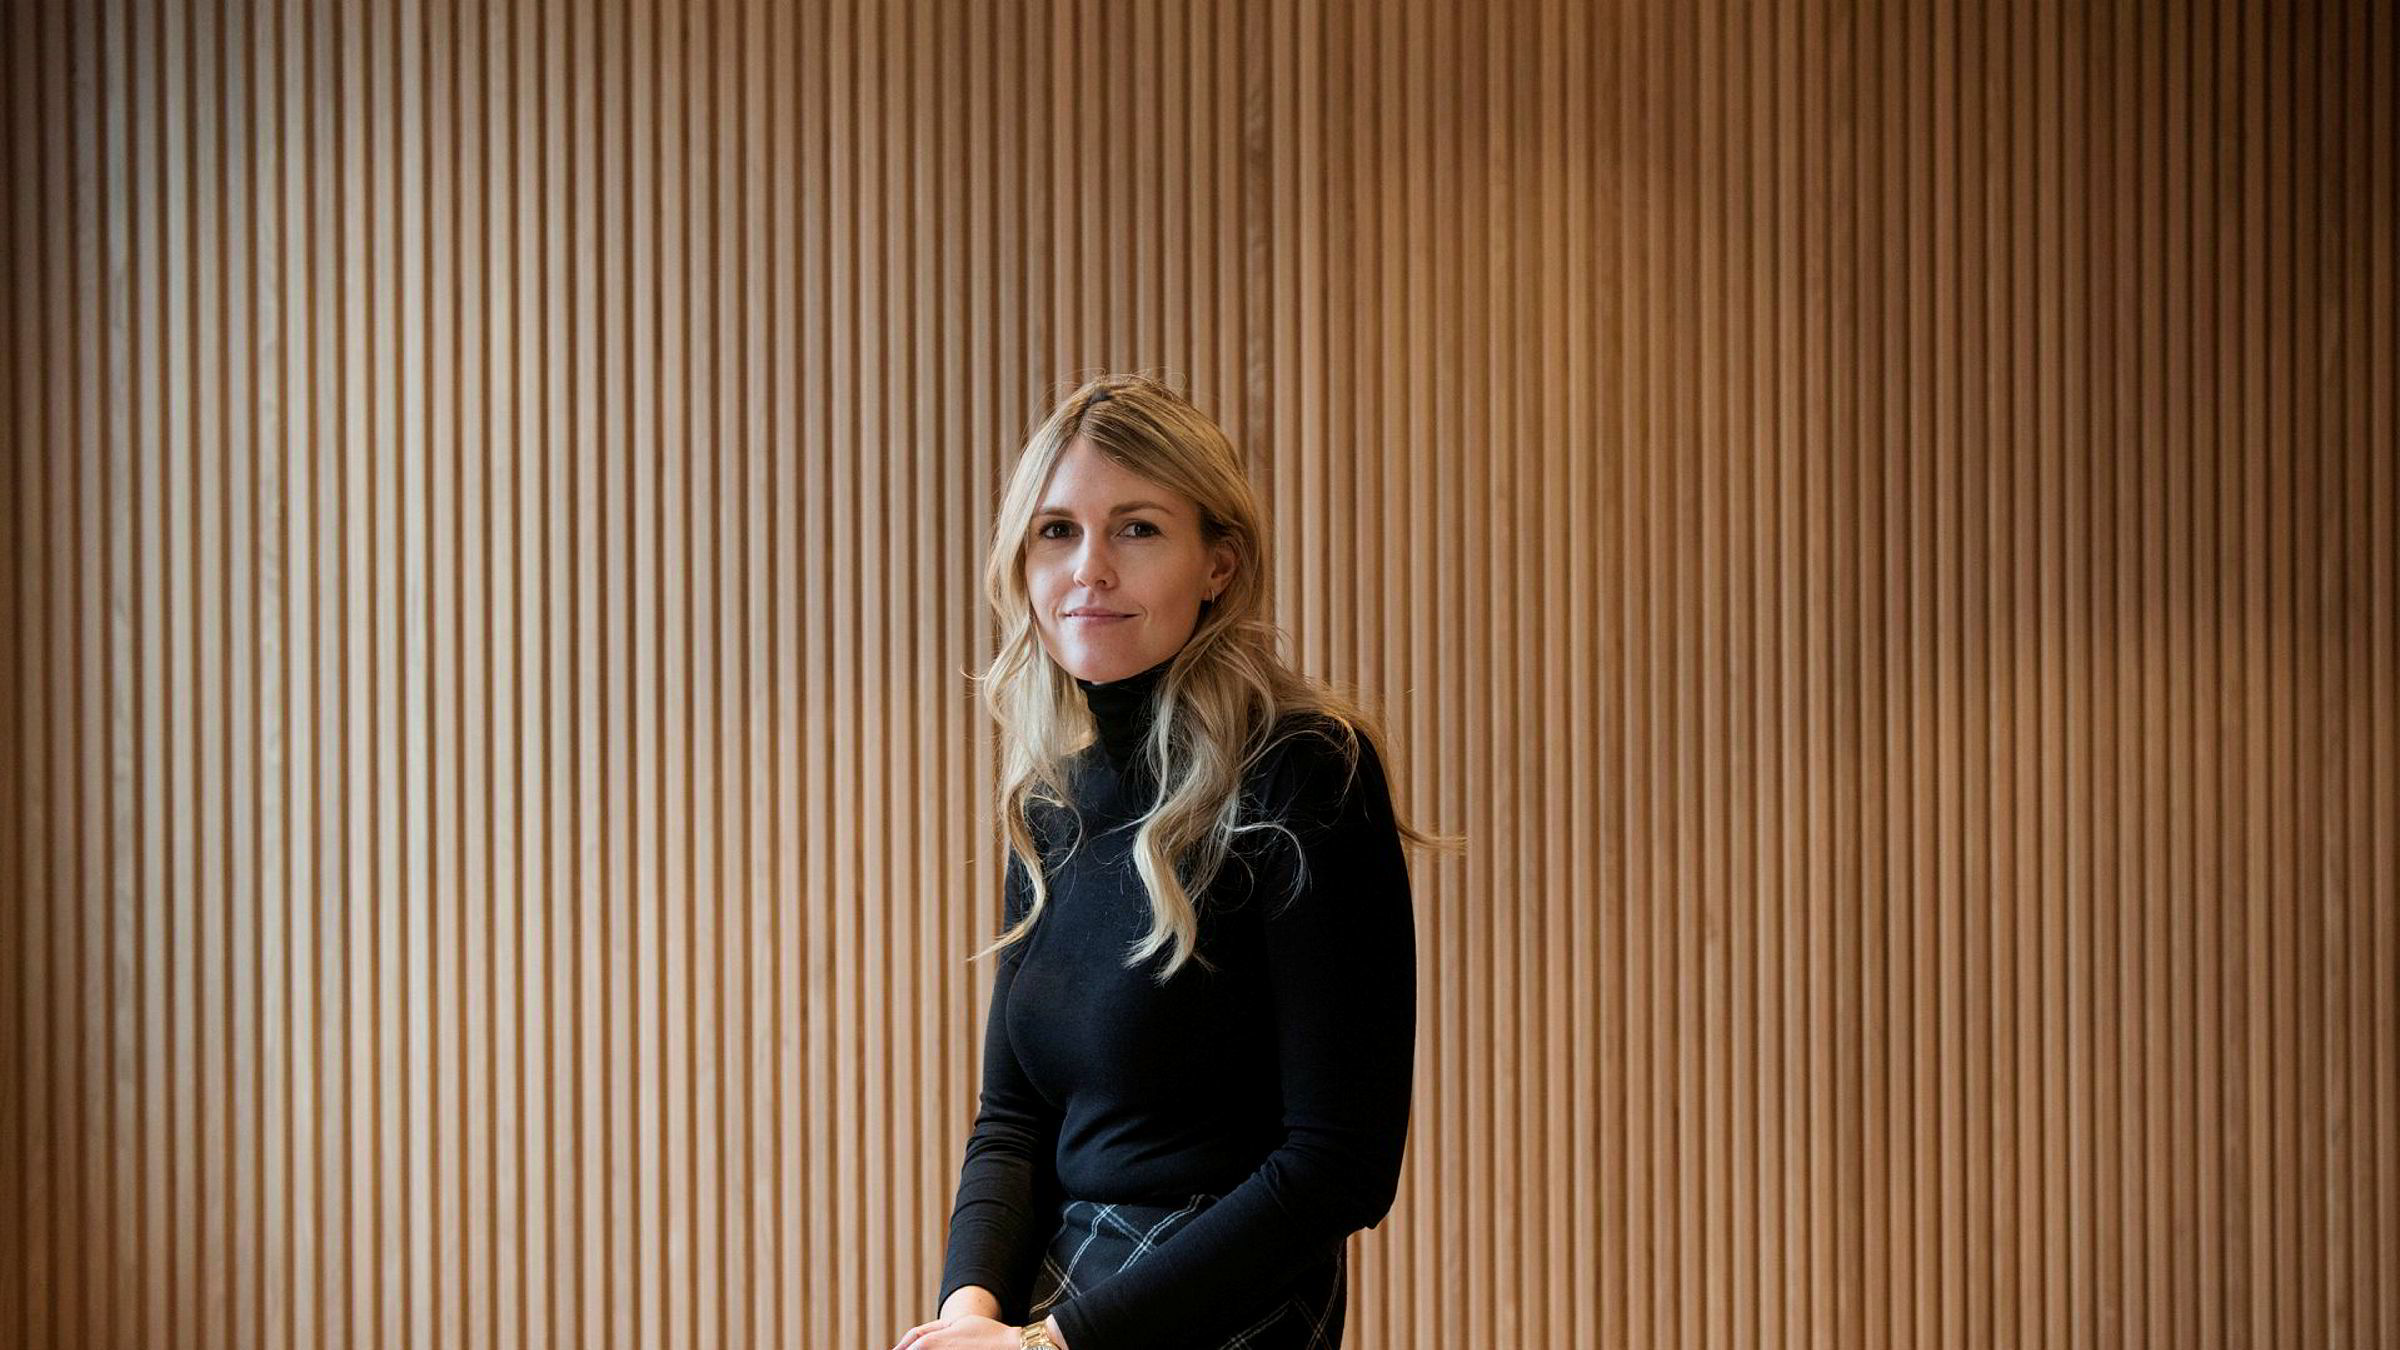 Anna Margaret Smedvig (34) styrer Smedvig-familiens milliardformue. Hun er opplært ved middagsbordet.